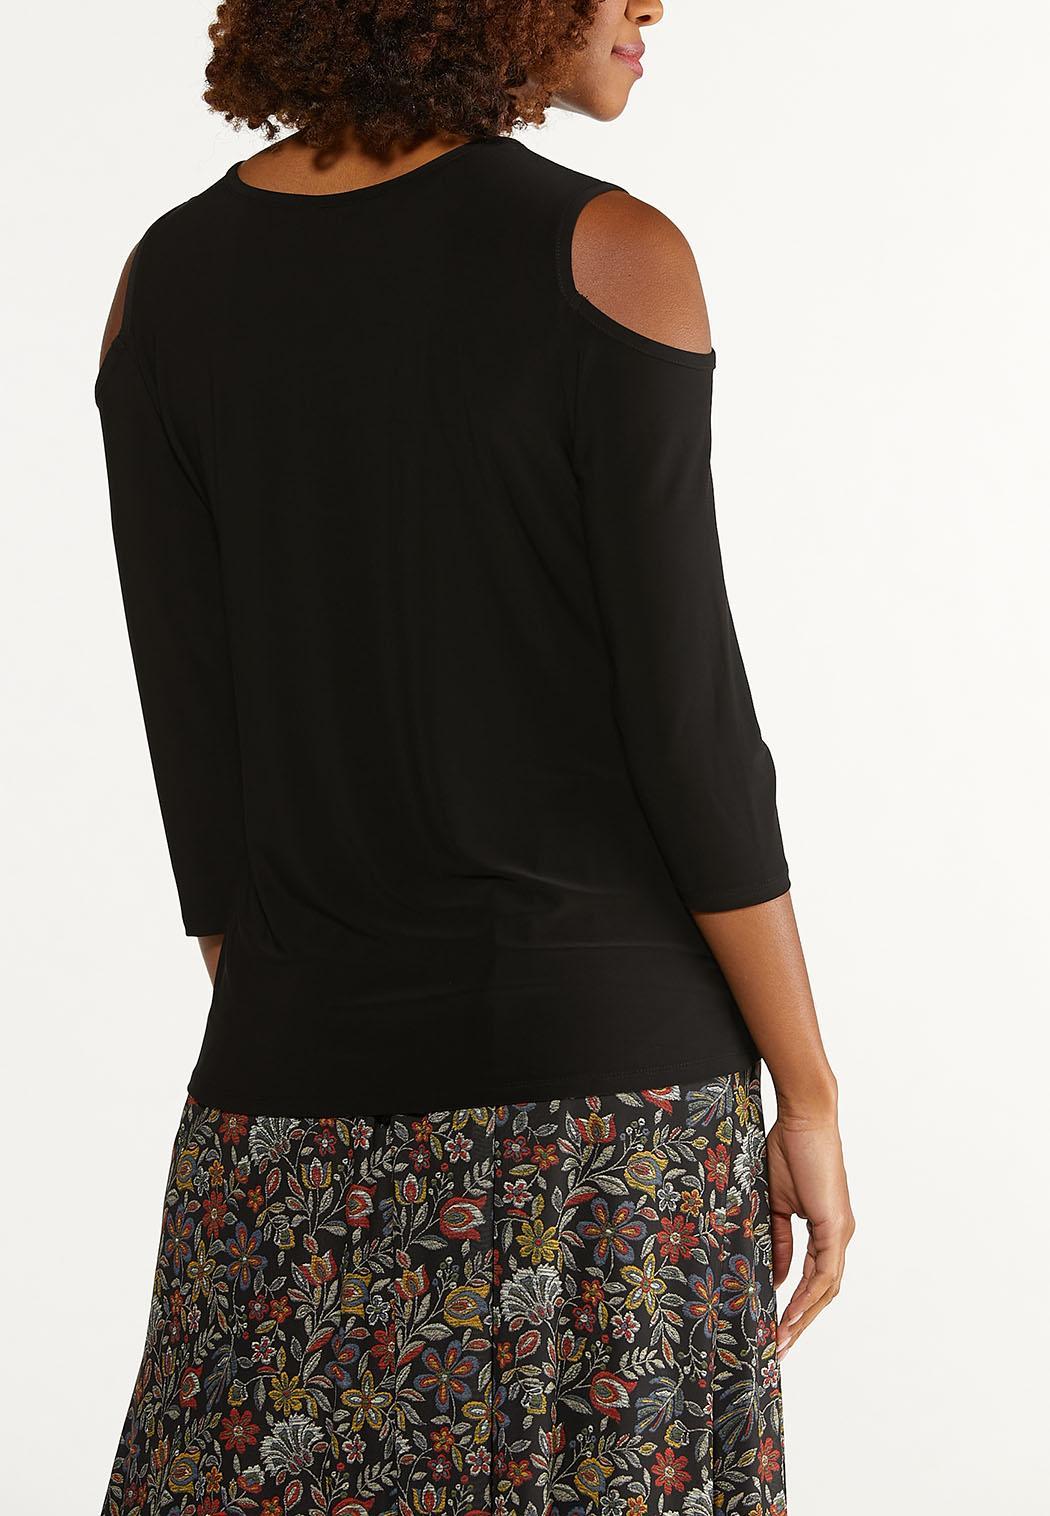 Plus Size Stretch Cold Shoulder Top (Item #44717018)